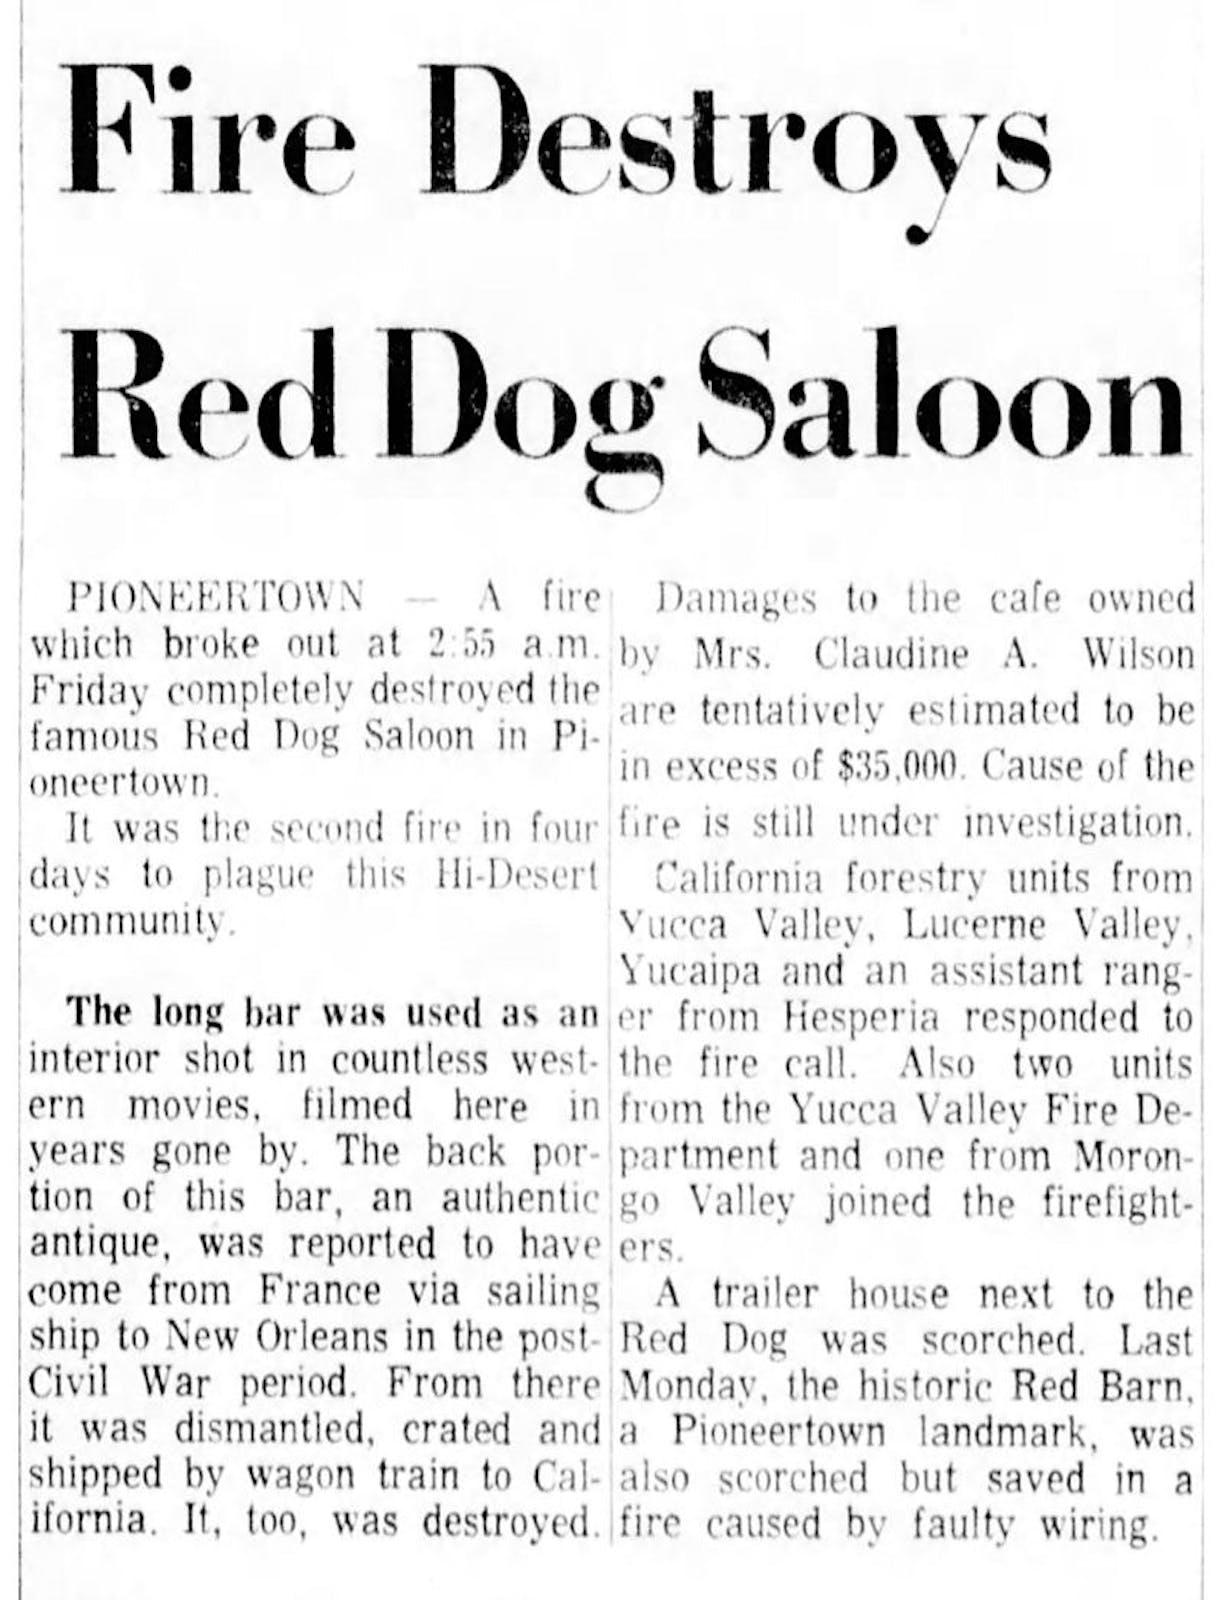 Apr. 9, 1966 - The San Bernardino County Sun article clipping